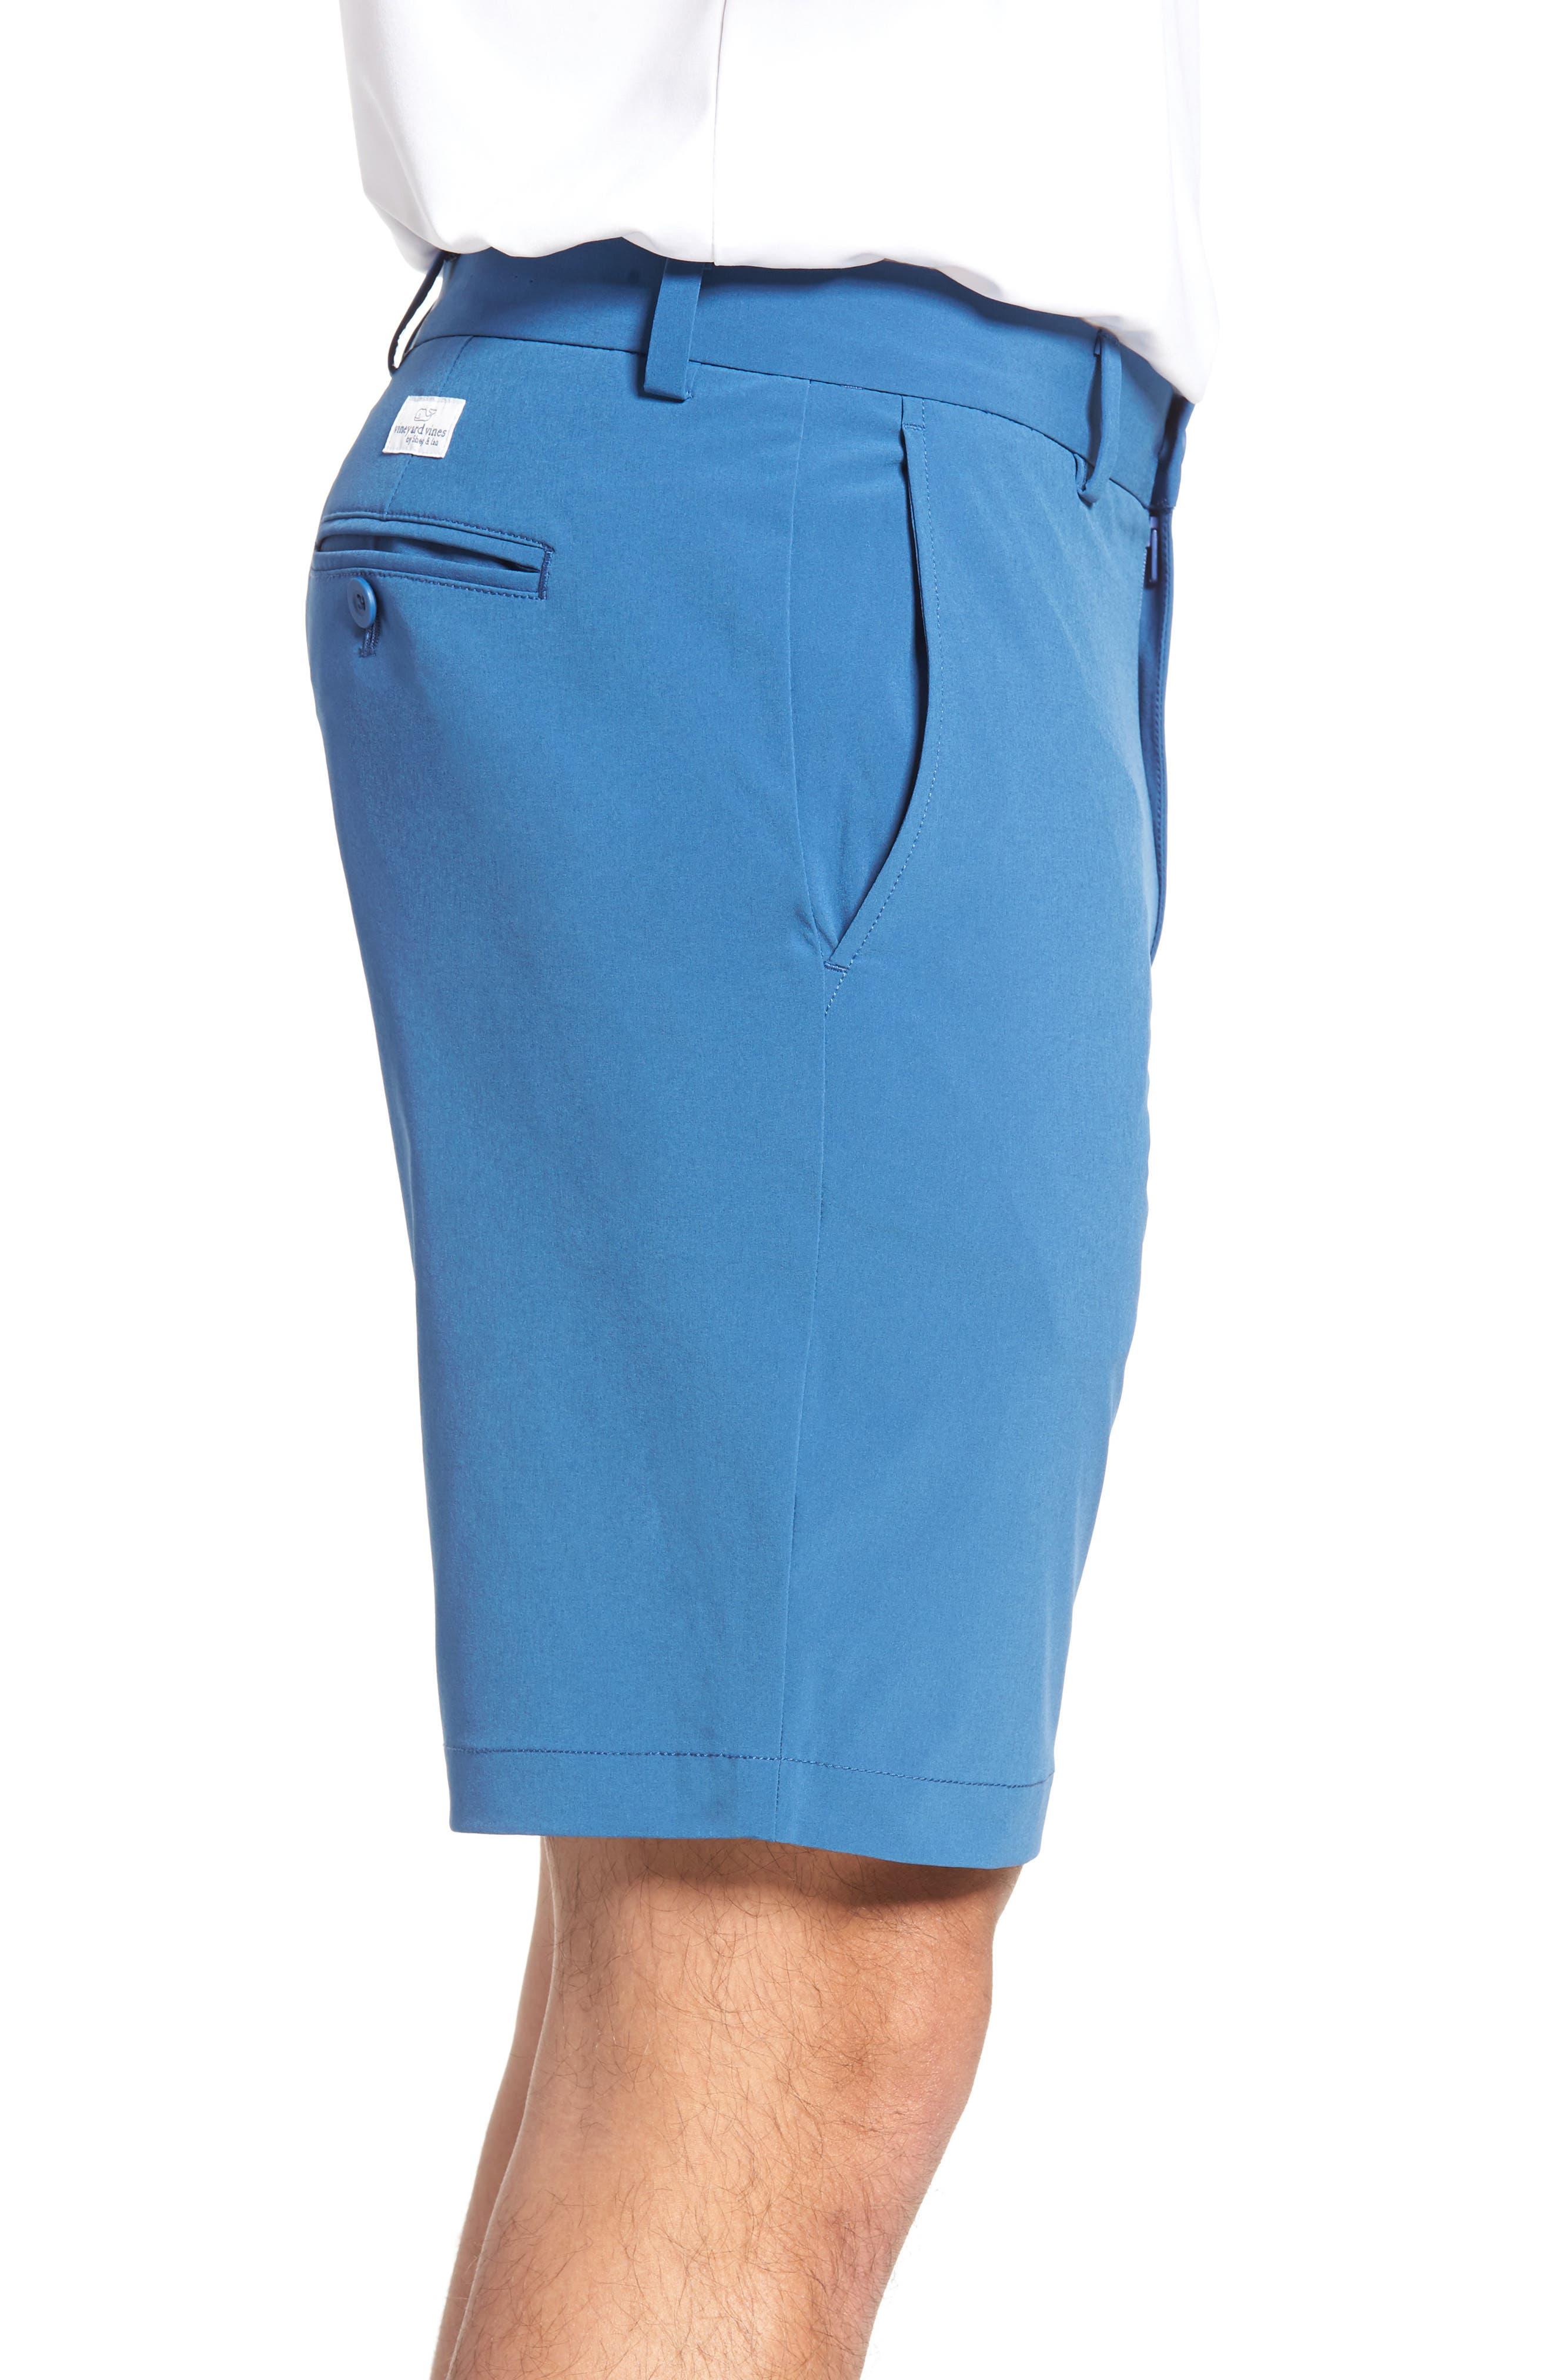 8 Inch Performance Breaker Shorts,                             Alternate thumbnail 41, color,